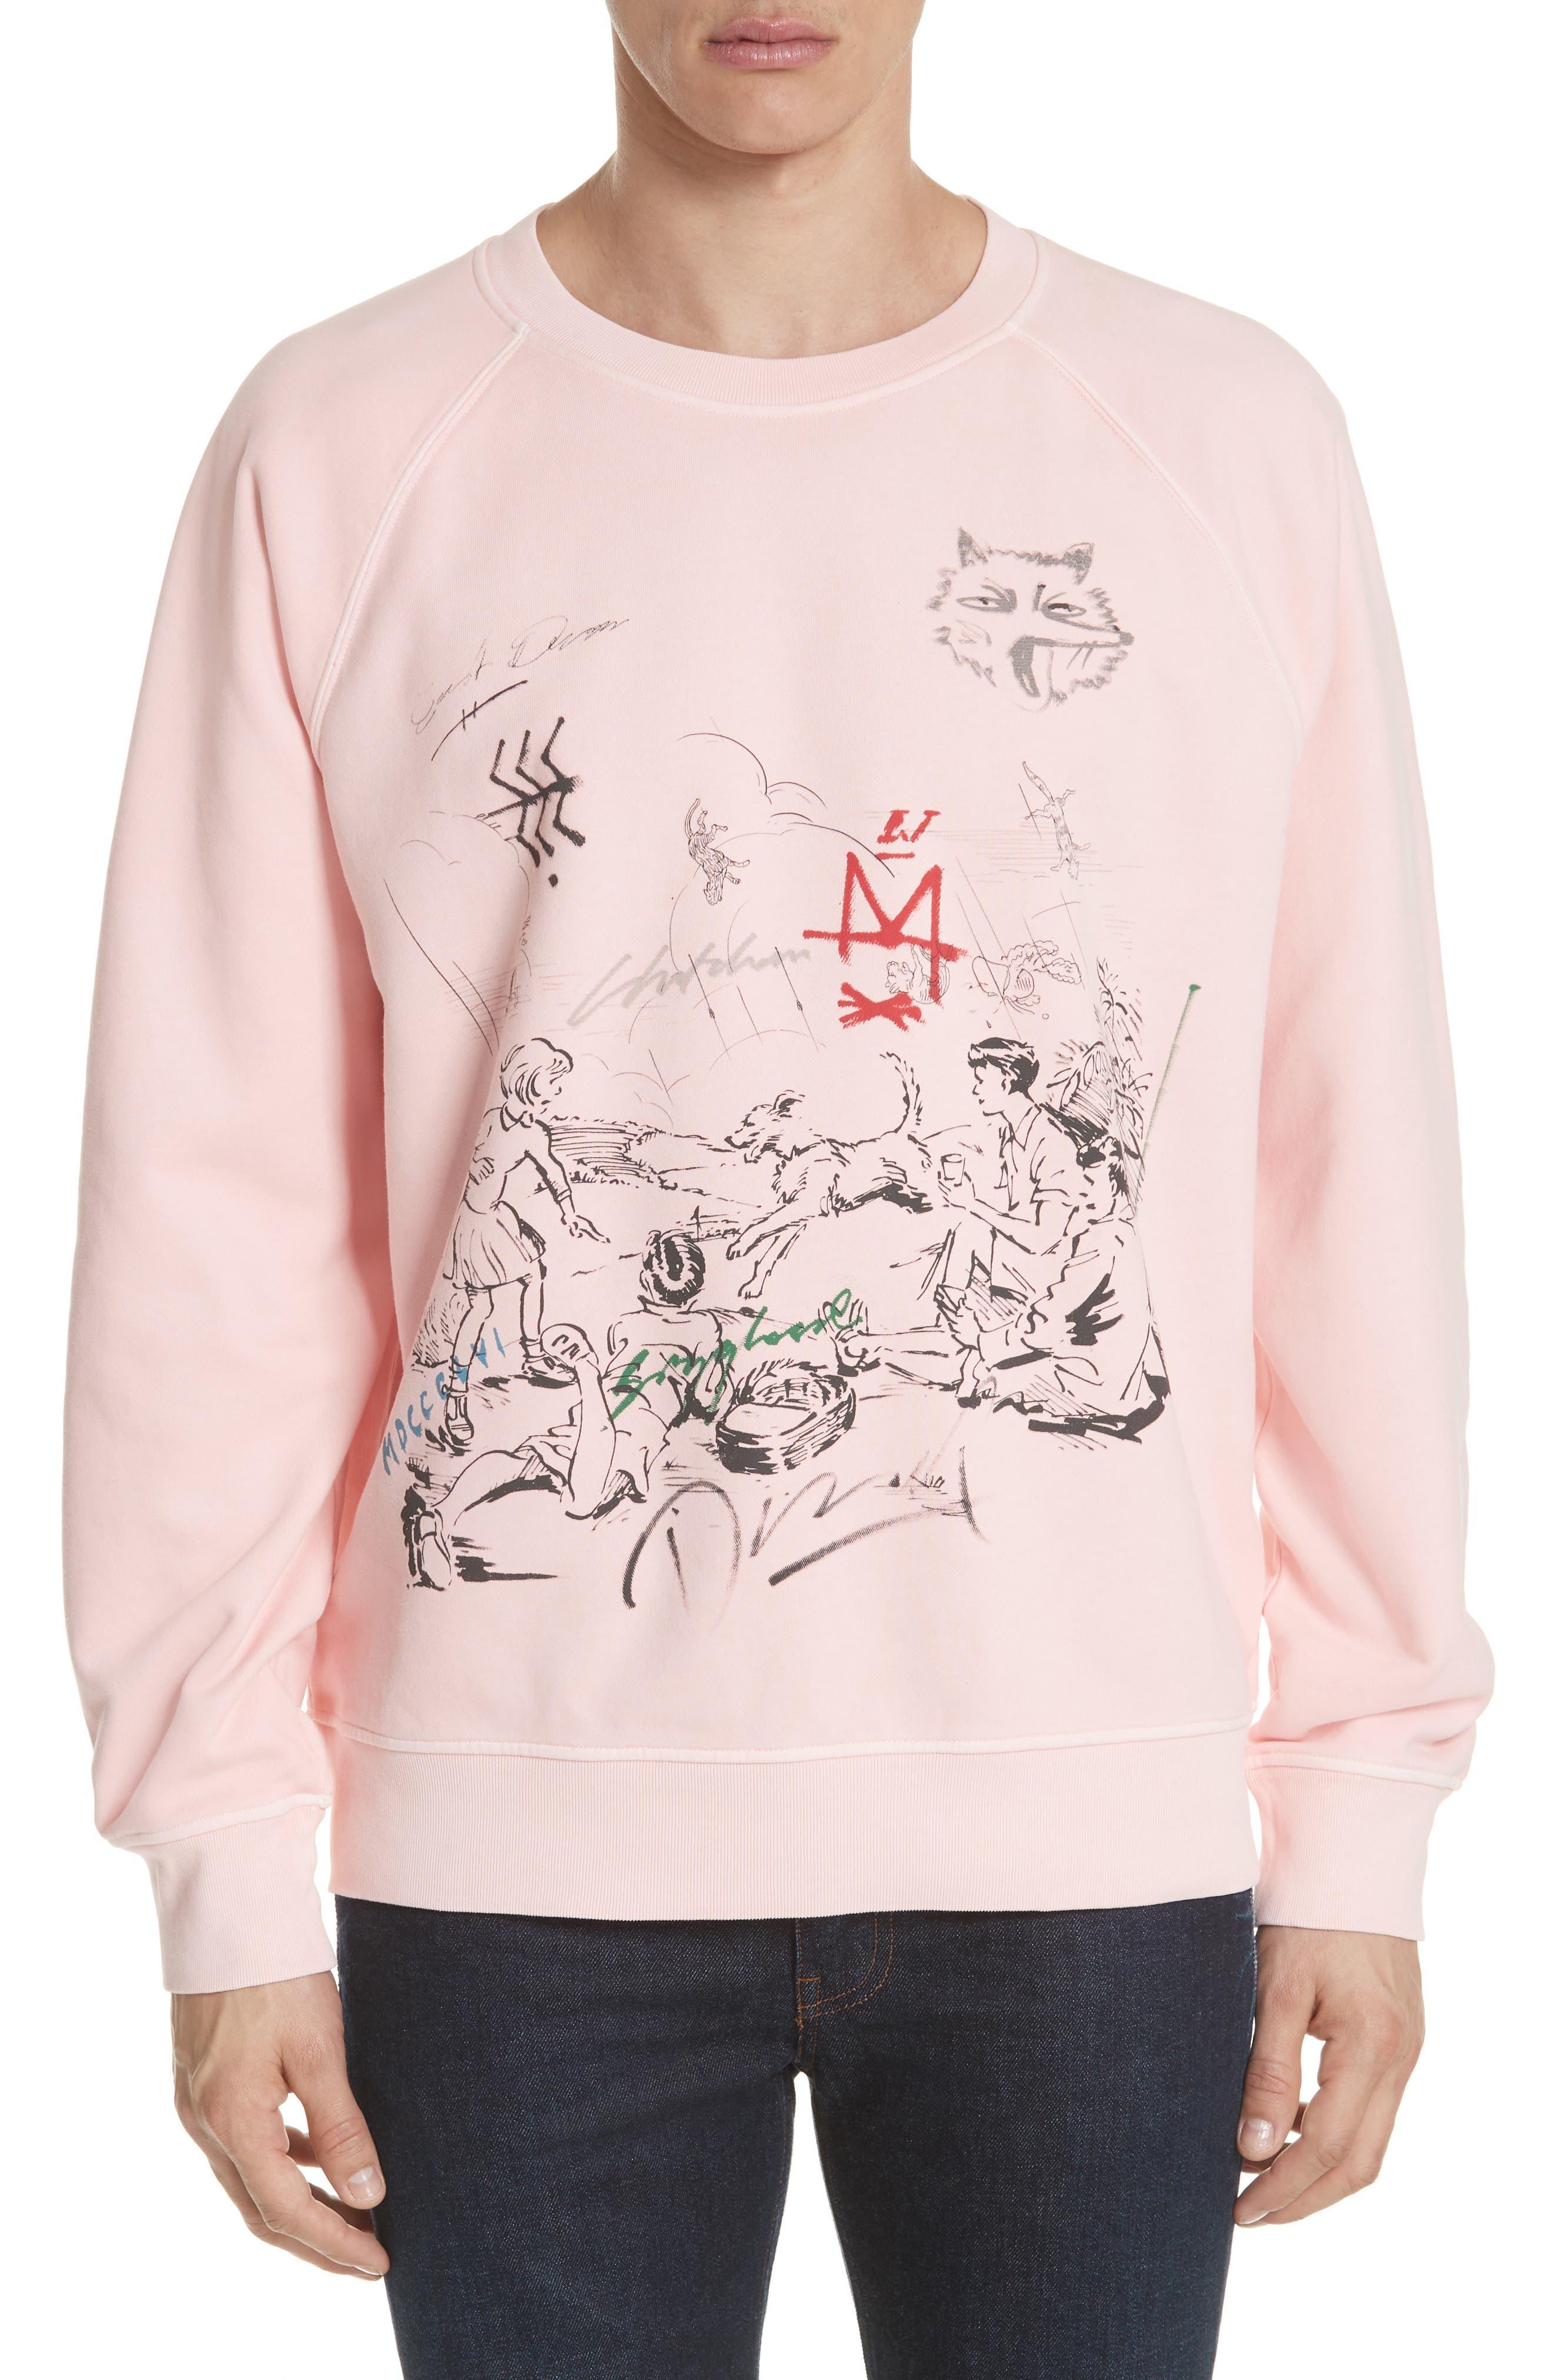 Fellworth Graphic Crewneck Sweatshirt,                         Main,                         color, 685